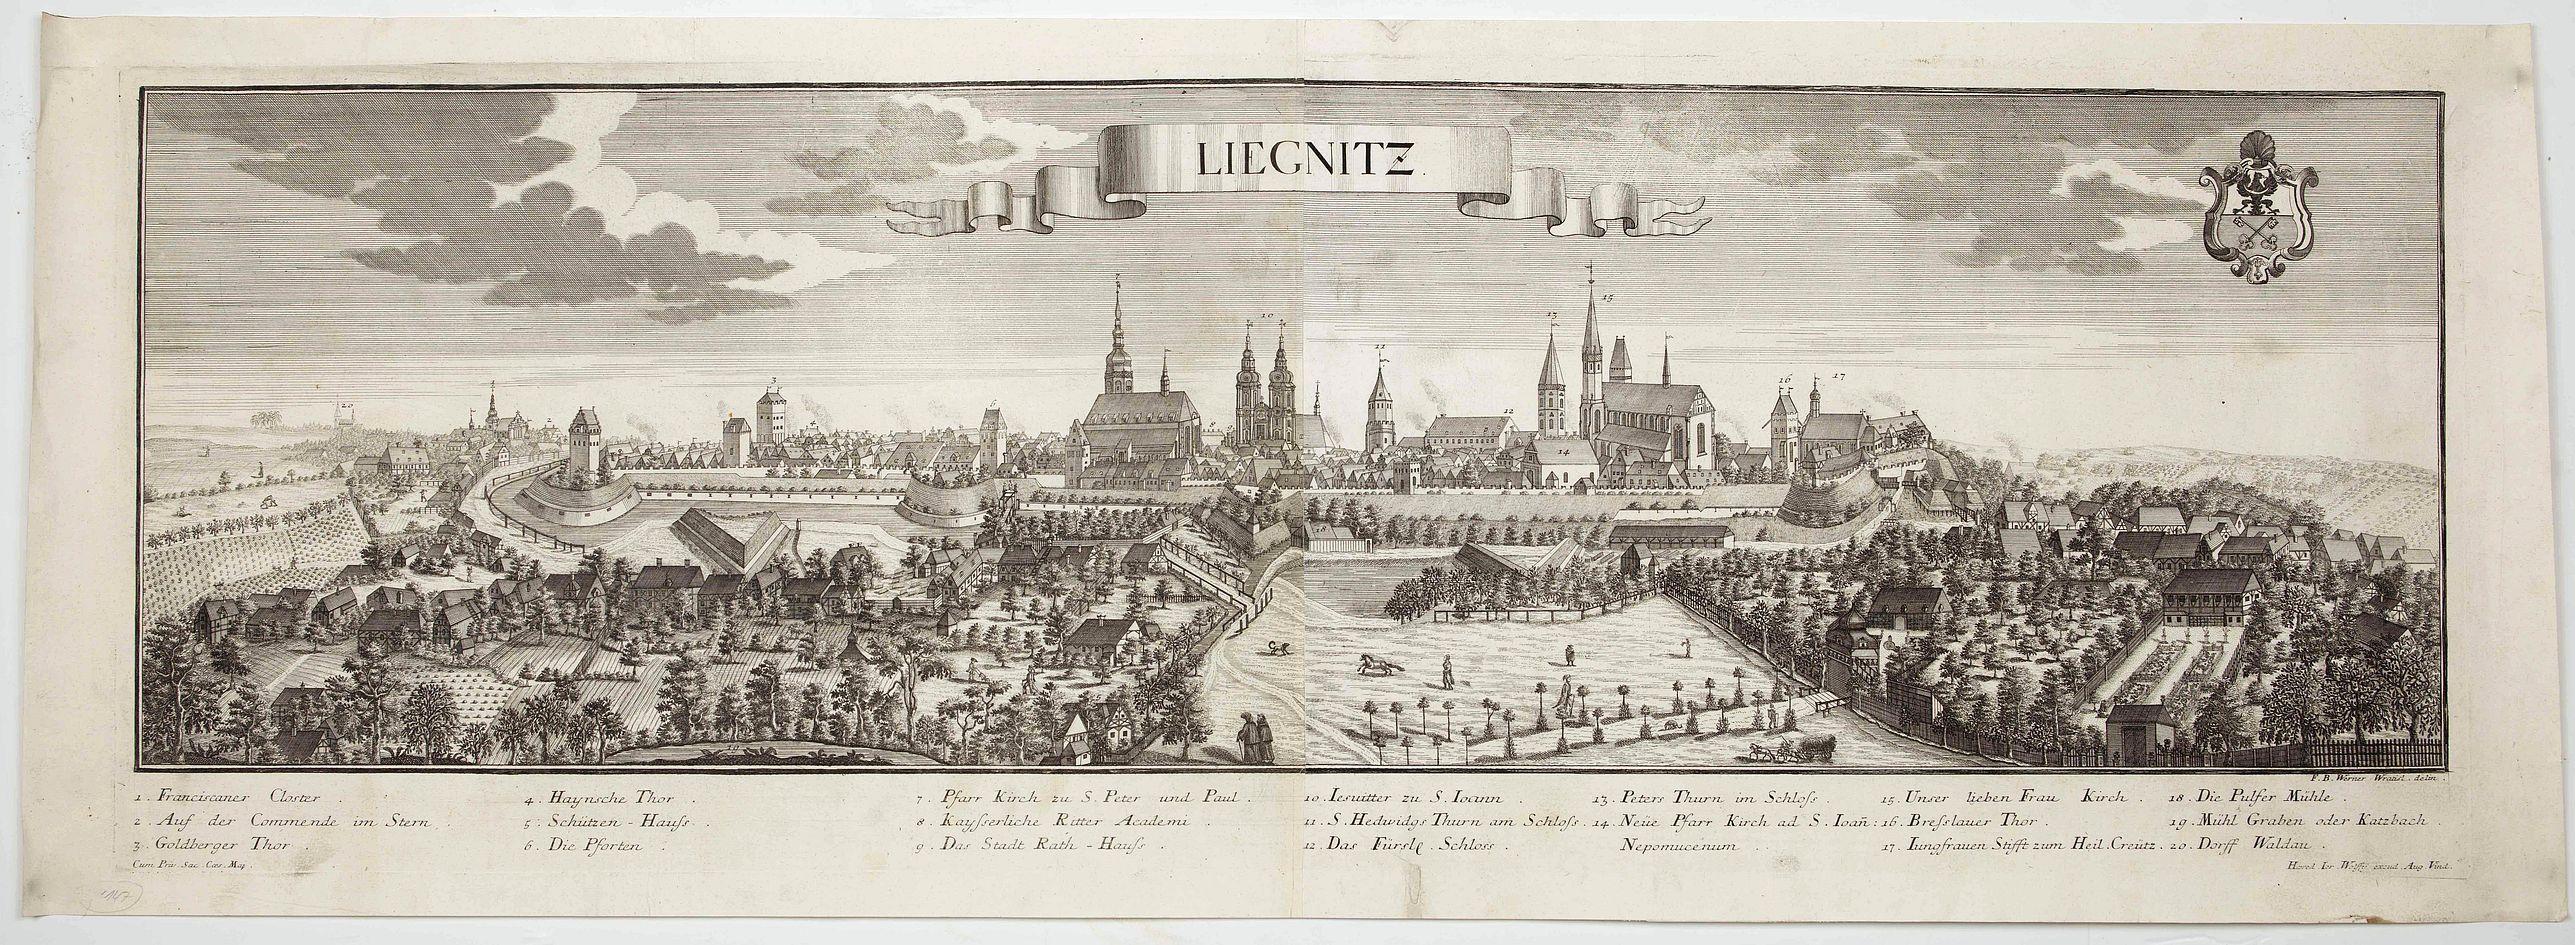 WOLFF, J. heirs / WERNER, F. B. -  Lirgnitz. (Legnica)